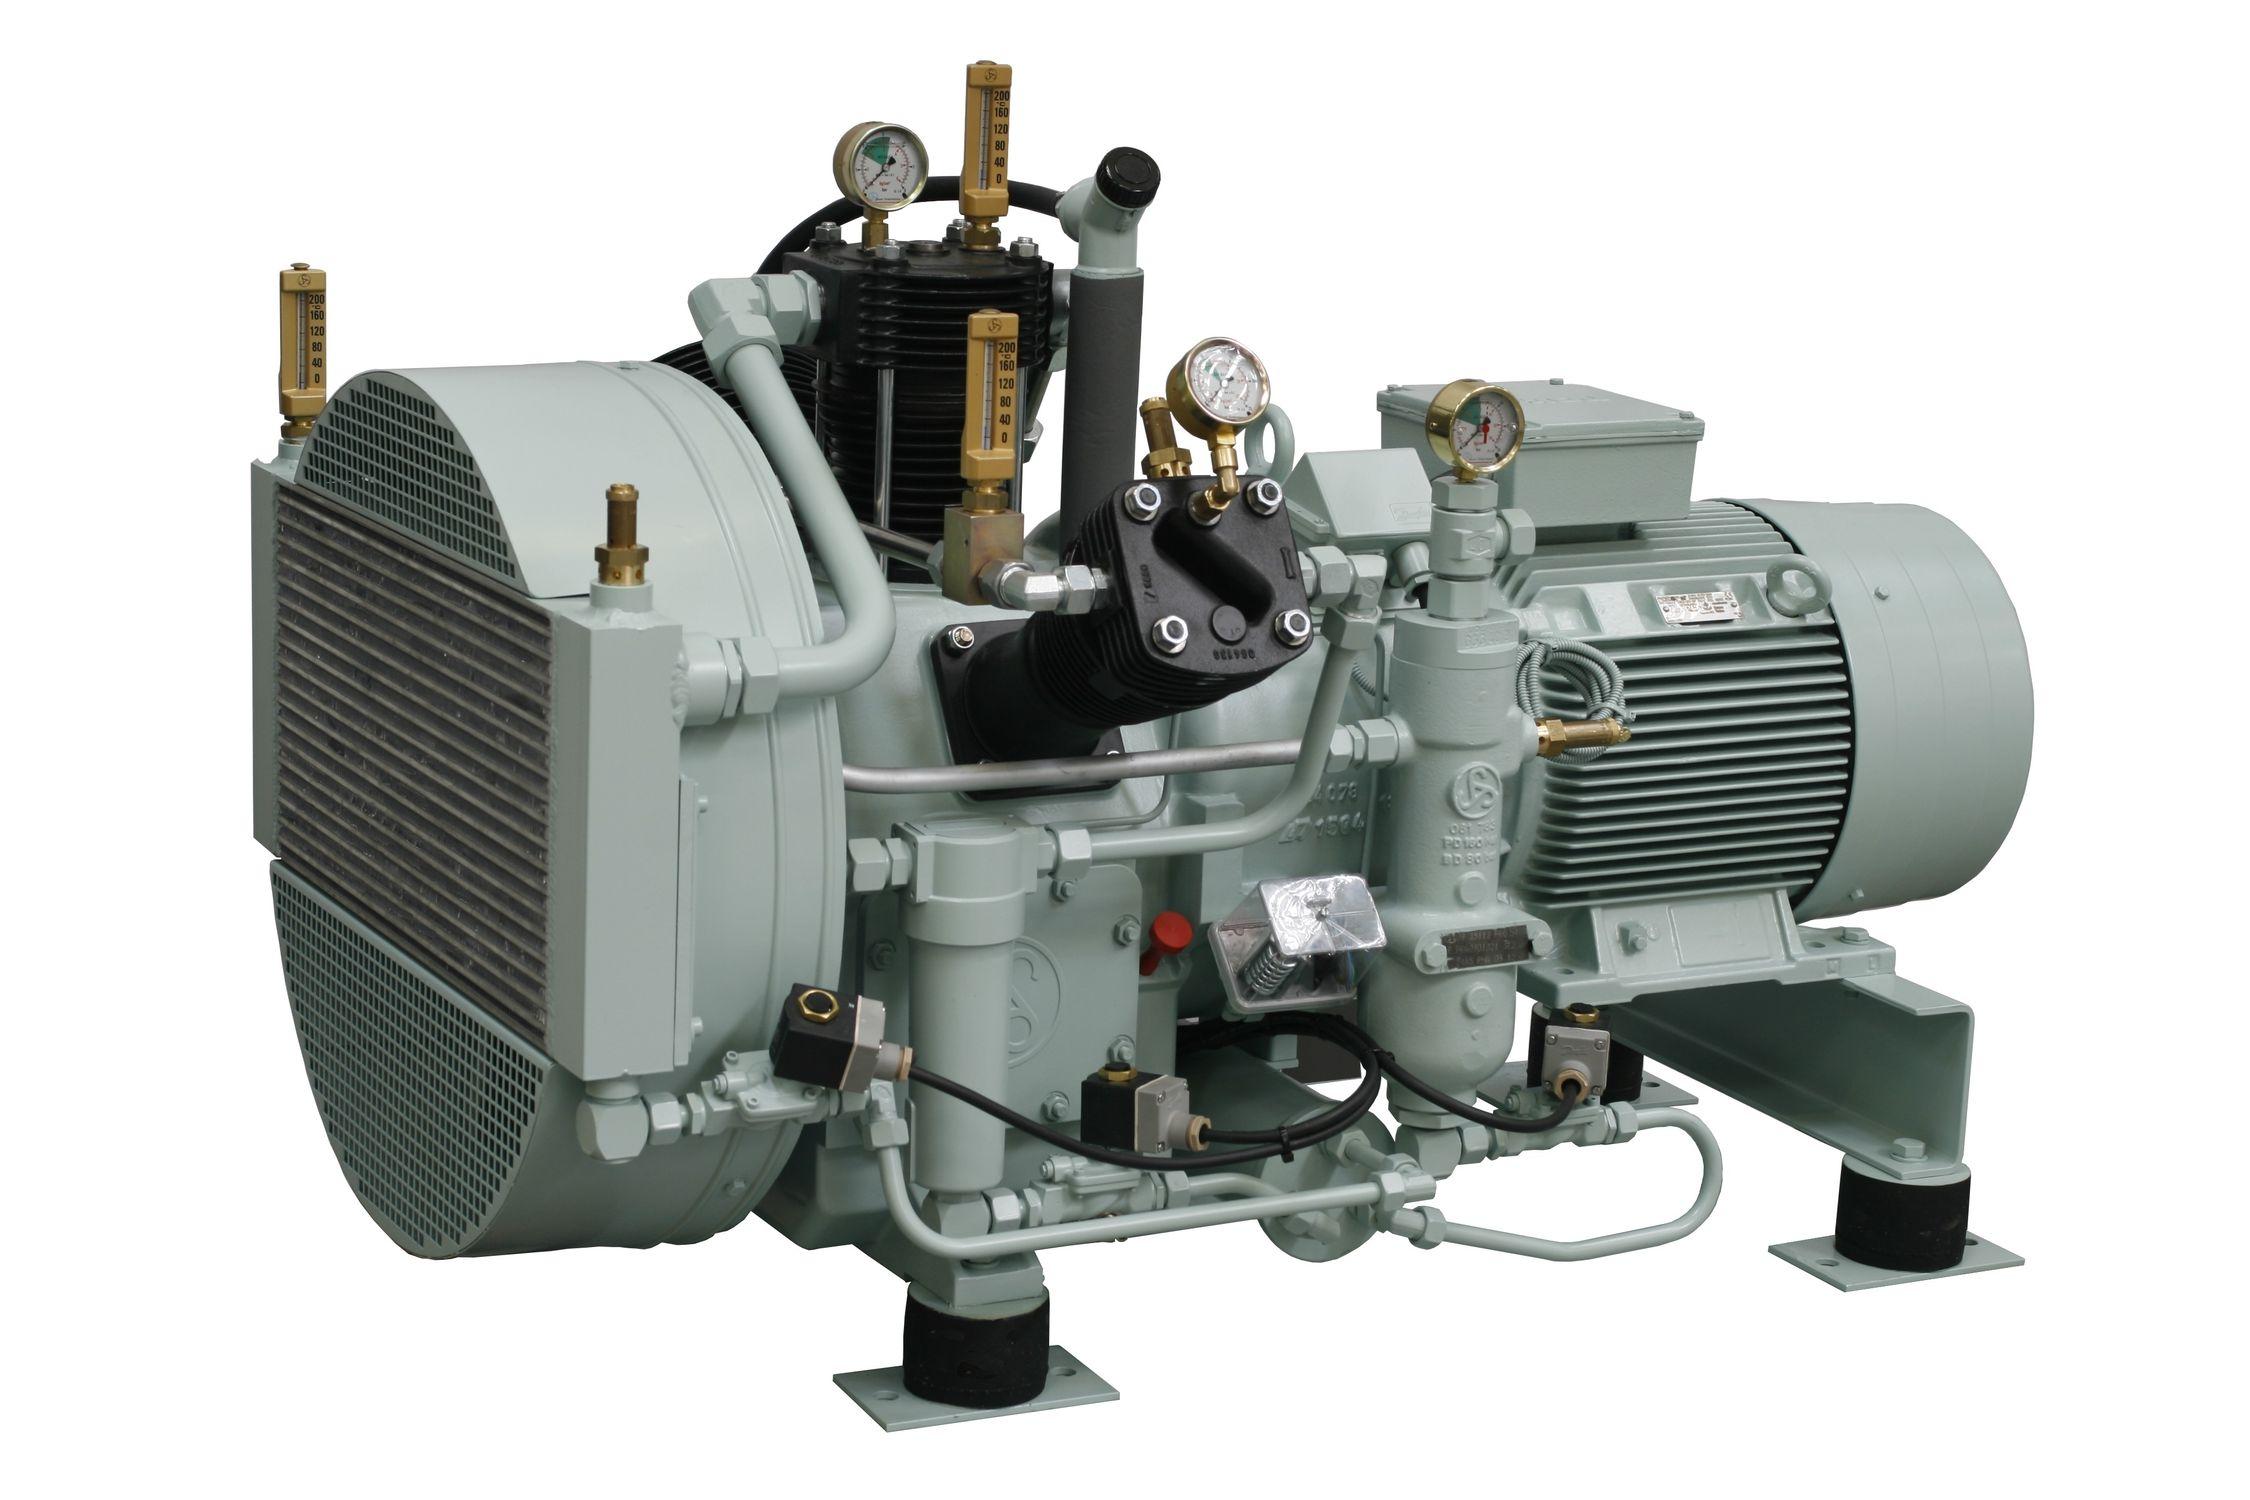 Sauer Compressor - 3 Stage Air Cooled Compressor (Passat Series)